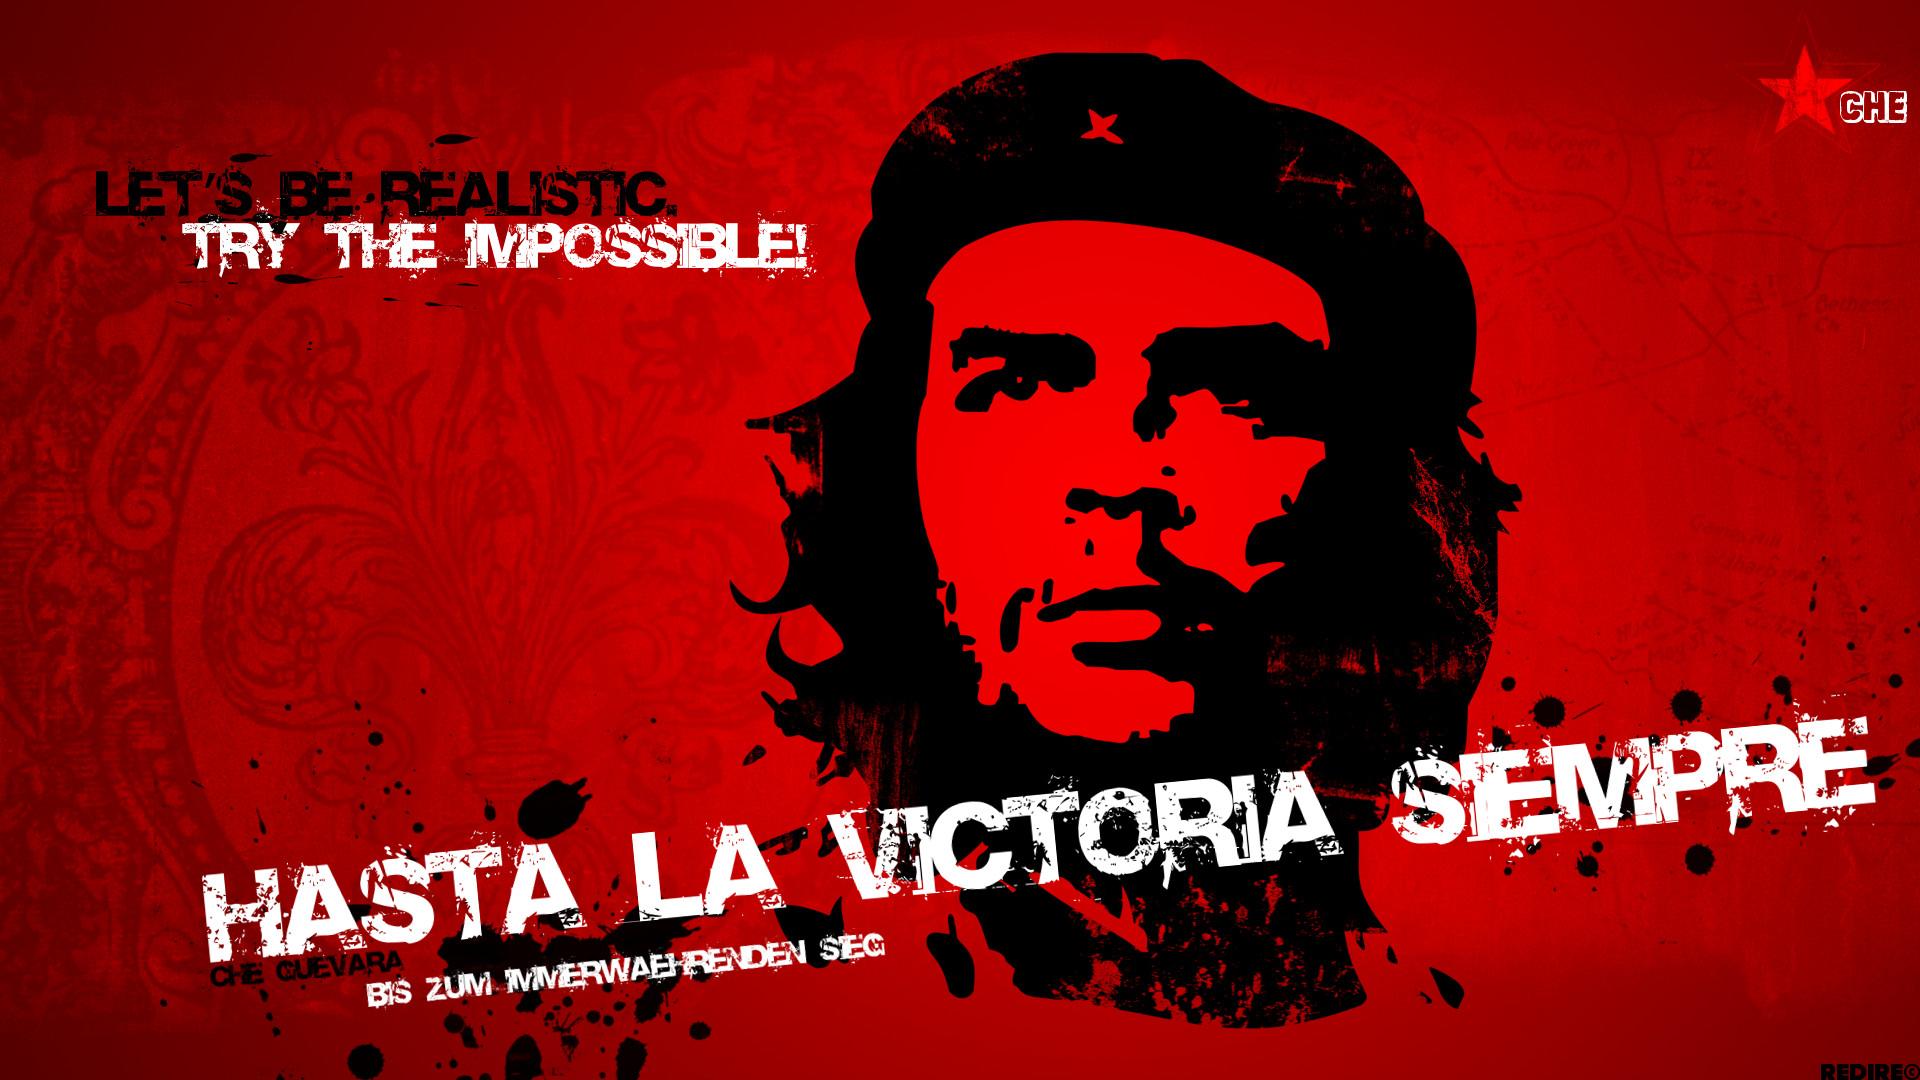 Che Guevara by Cruzios Che Guevara by Cruzios